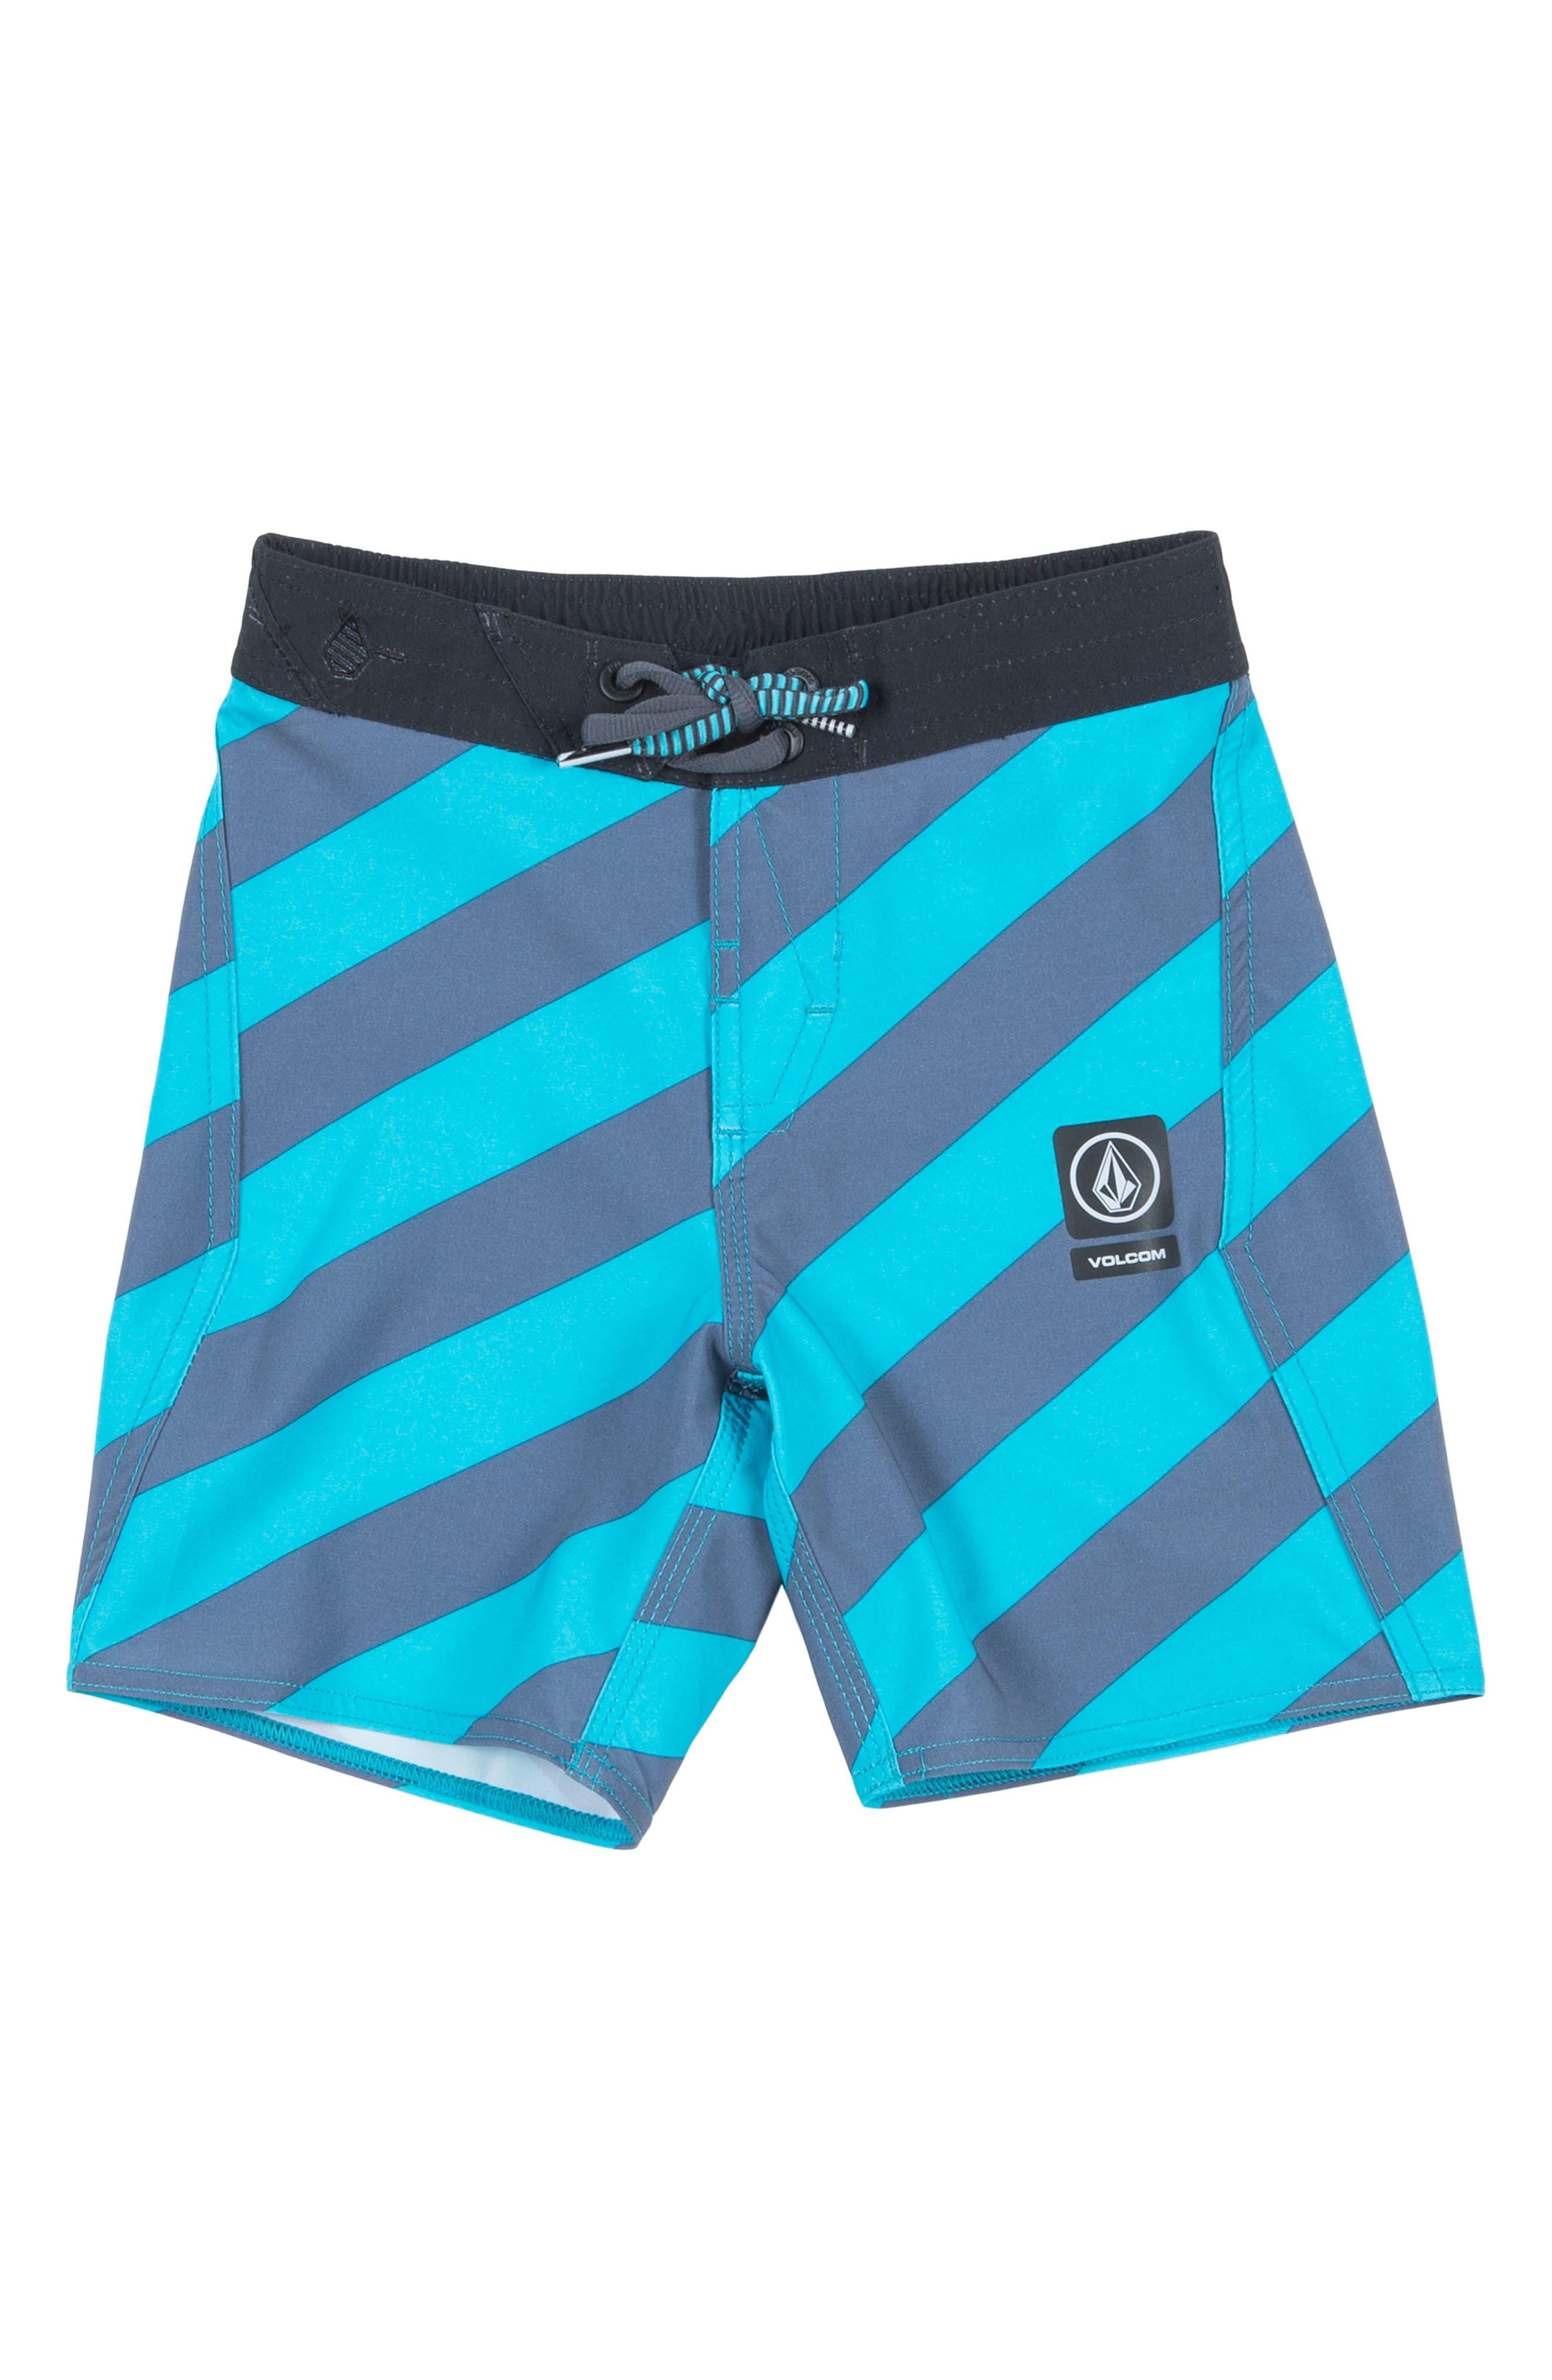 Stripey Jammer Board Shorts,                             Alternate thumbnail 12, color,